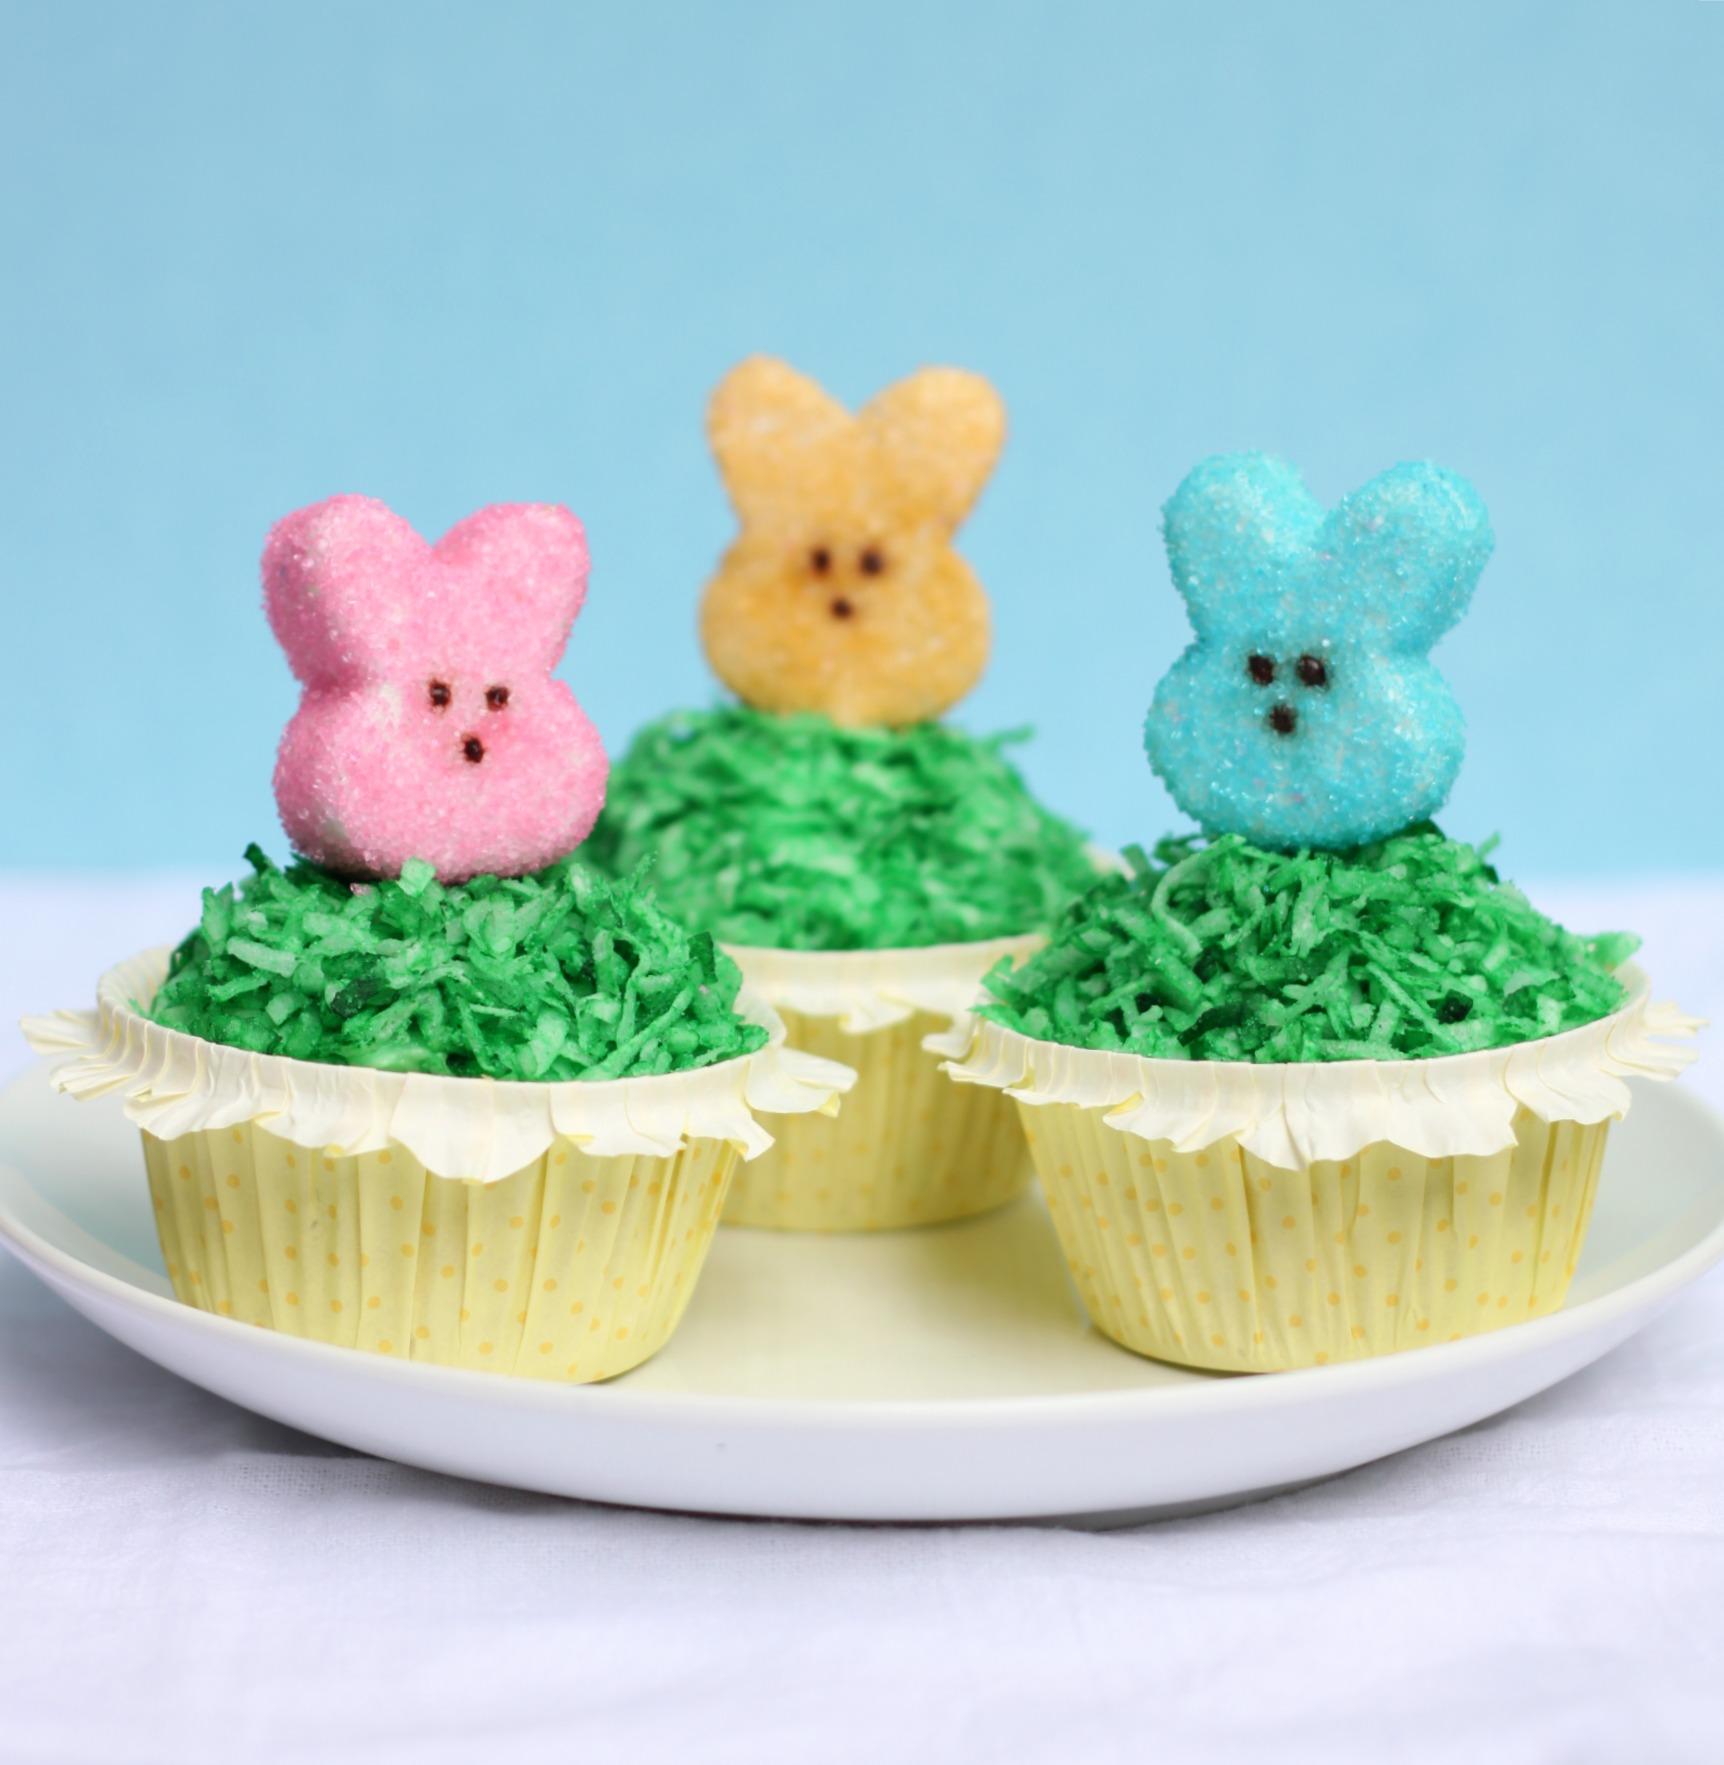 3 Peeps cupcakes